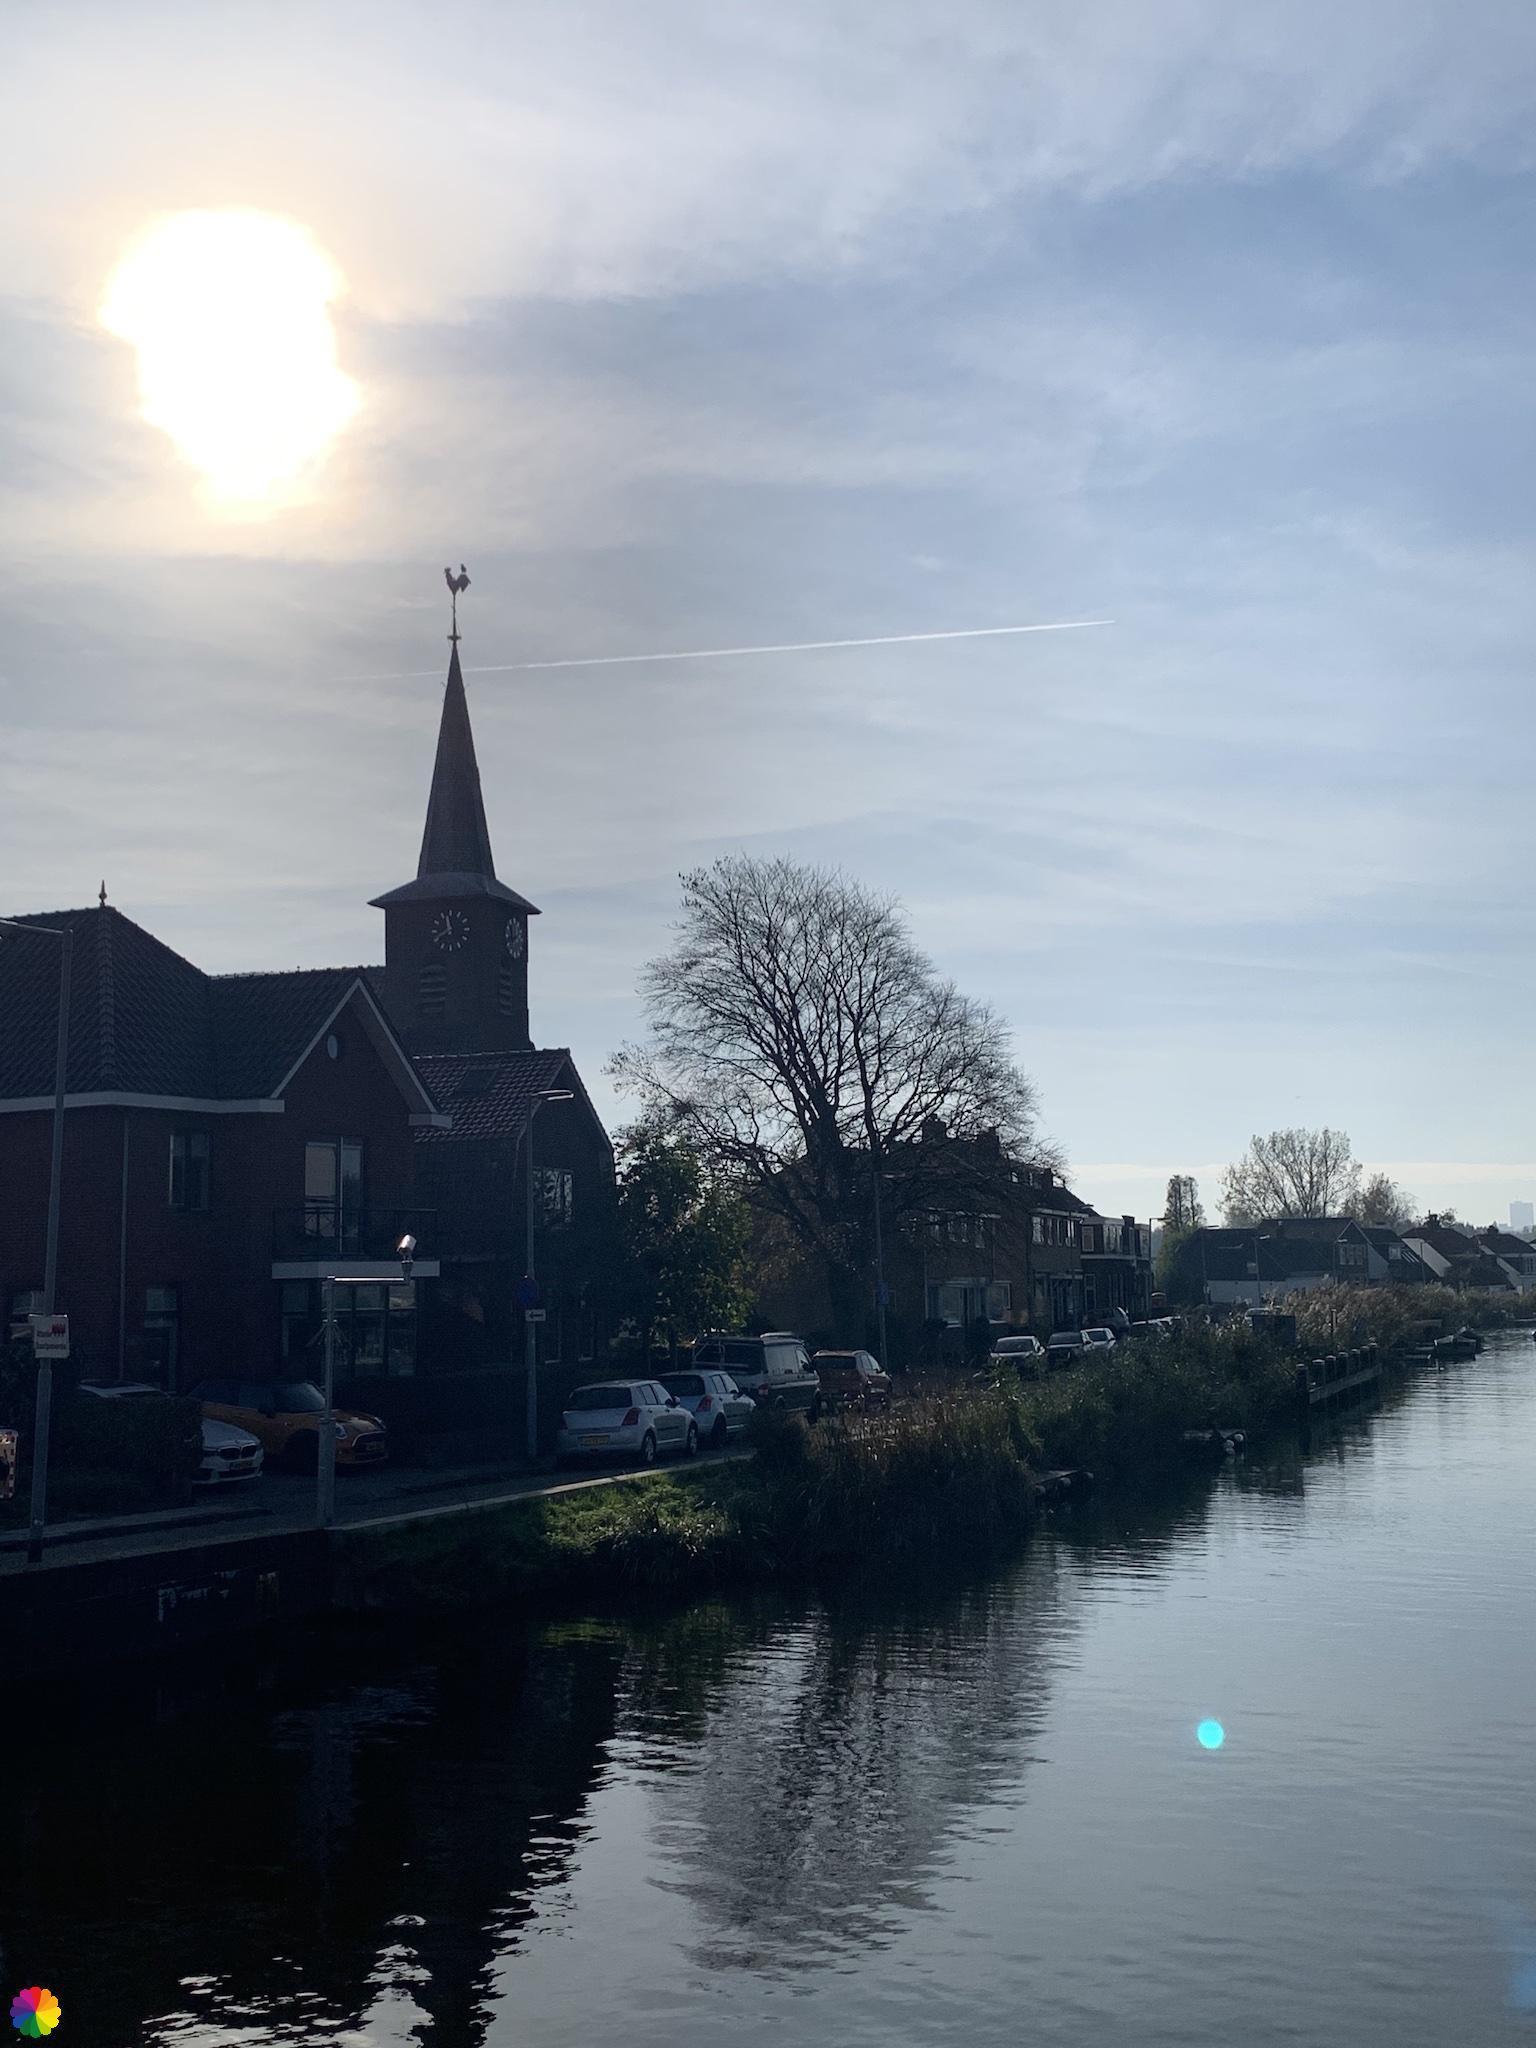 Kerkje in Terbregge